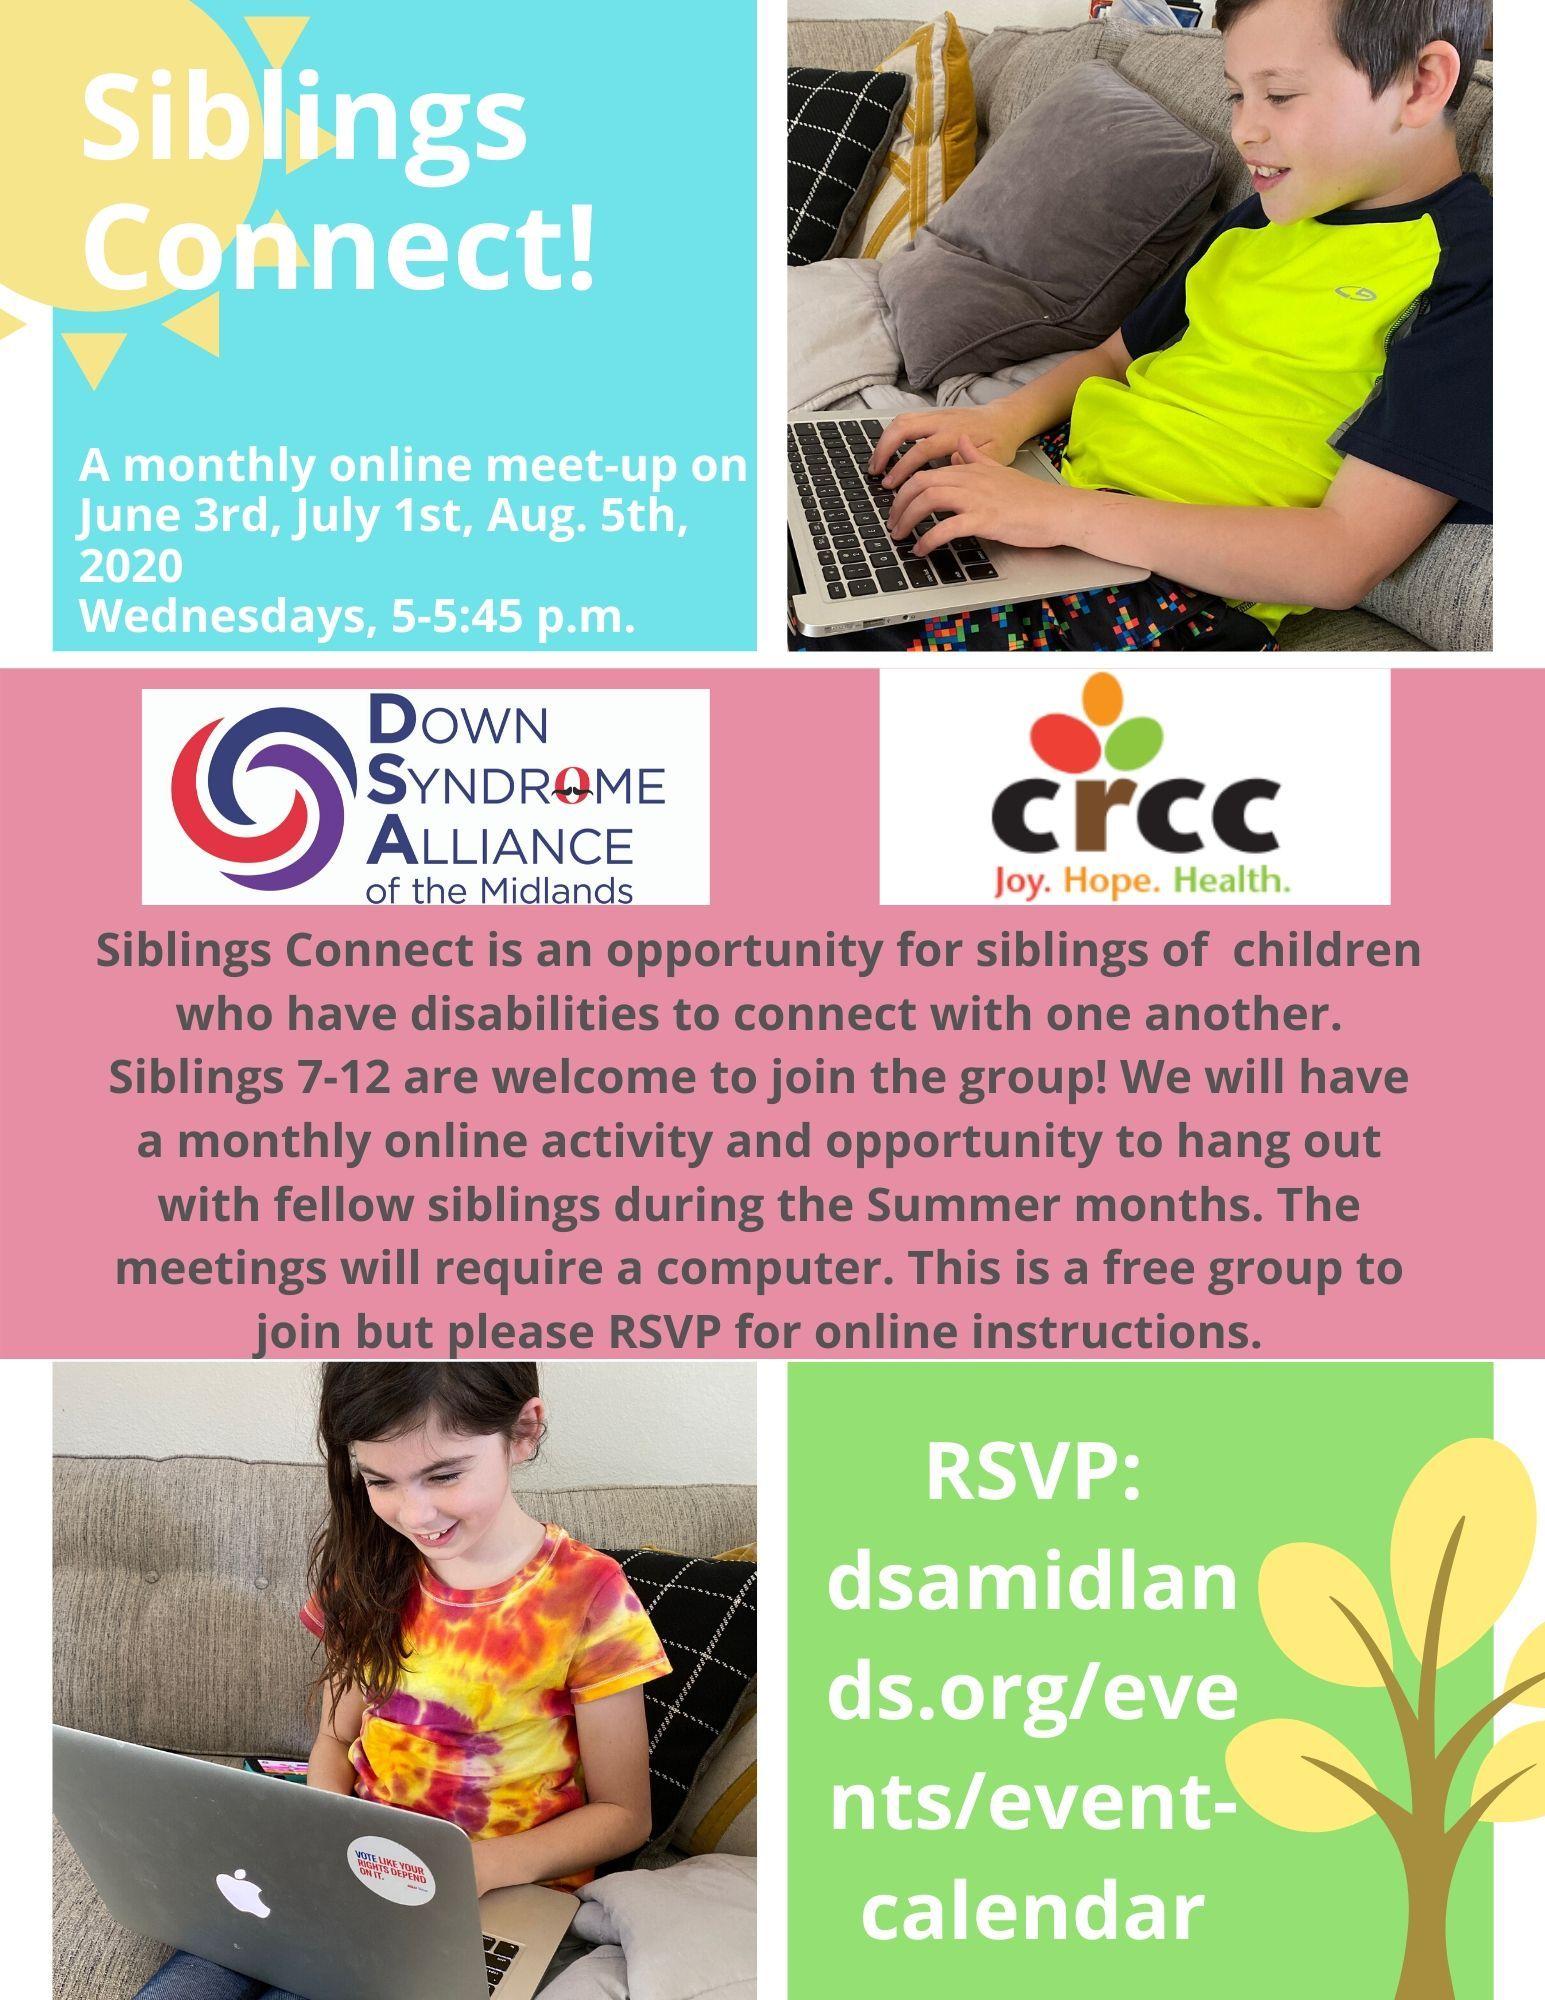 Siblings Connect